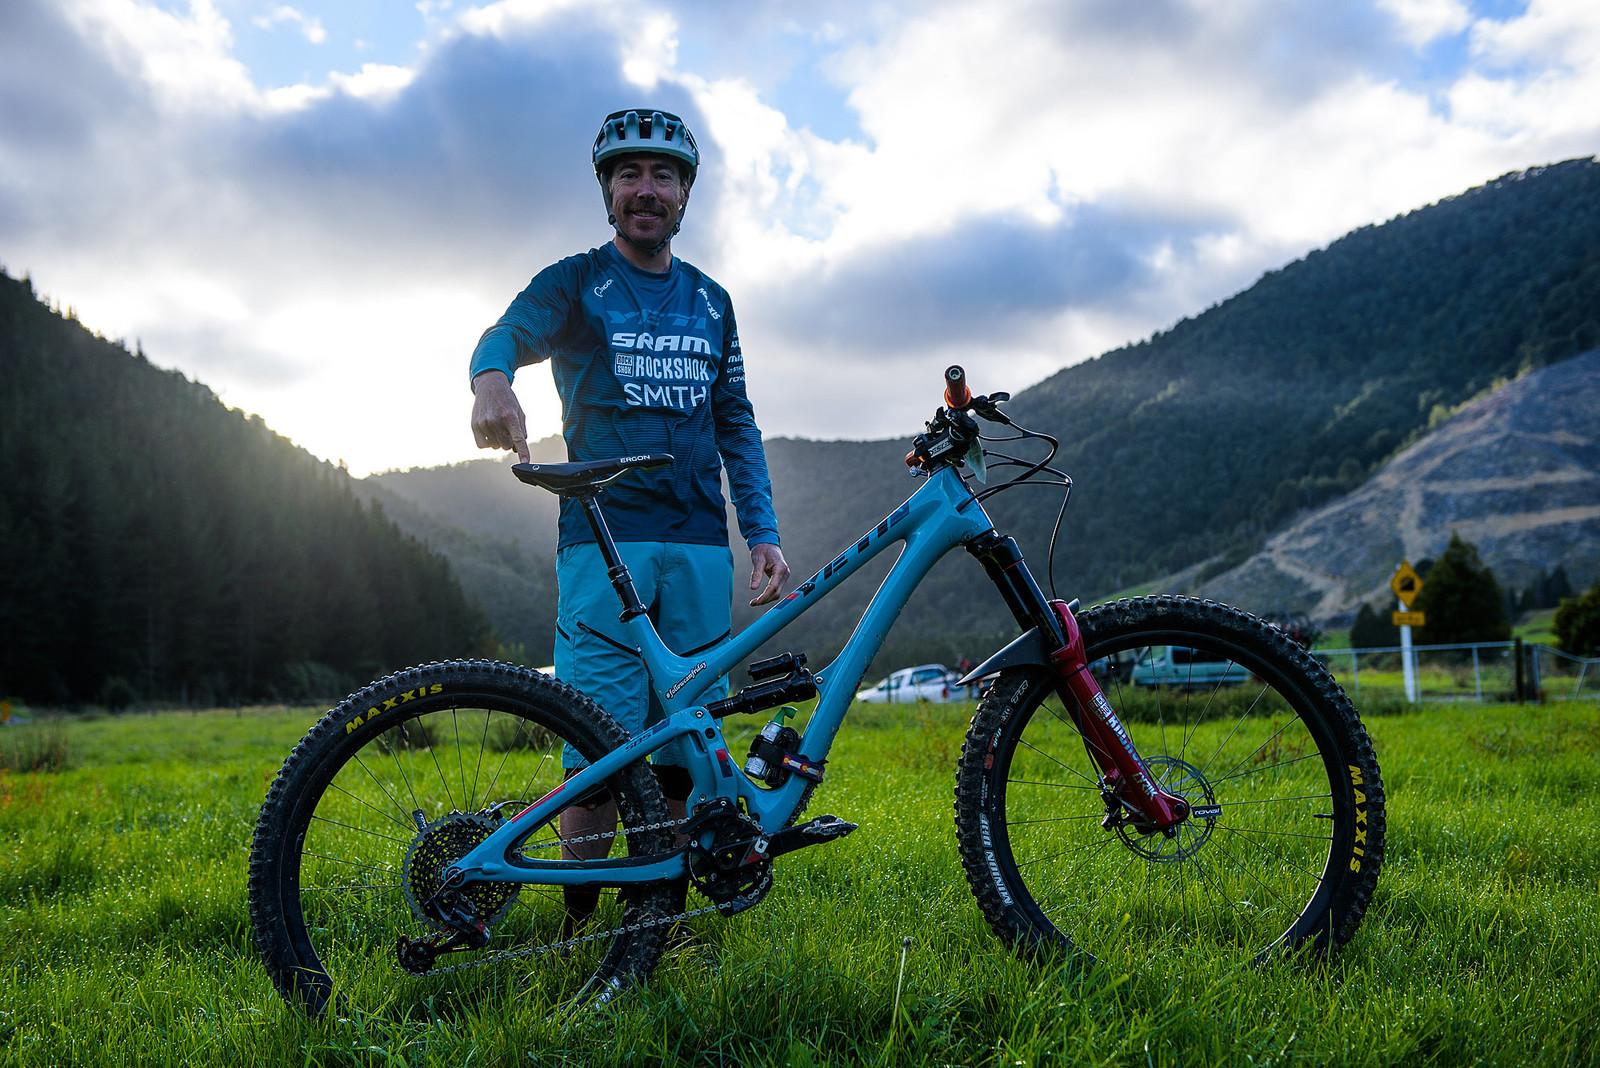 Nate Hills' Yeti SB5 with 2019 RockShox Lyrik - Nate Hills' Yeti SB5 with 2019 RockShox Lyrik - Mountain Biking Pictures - Vital MTB